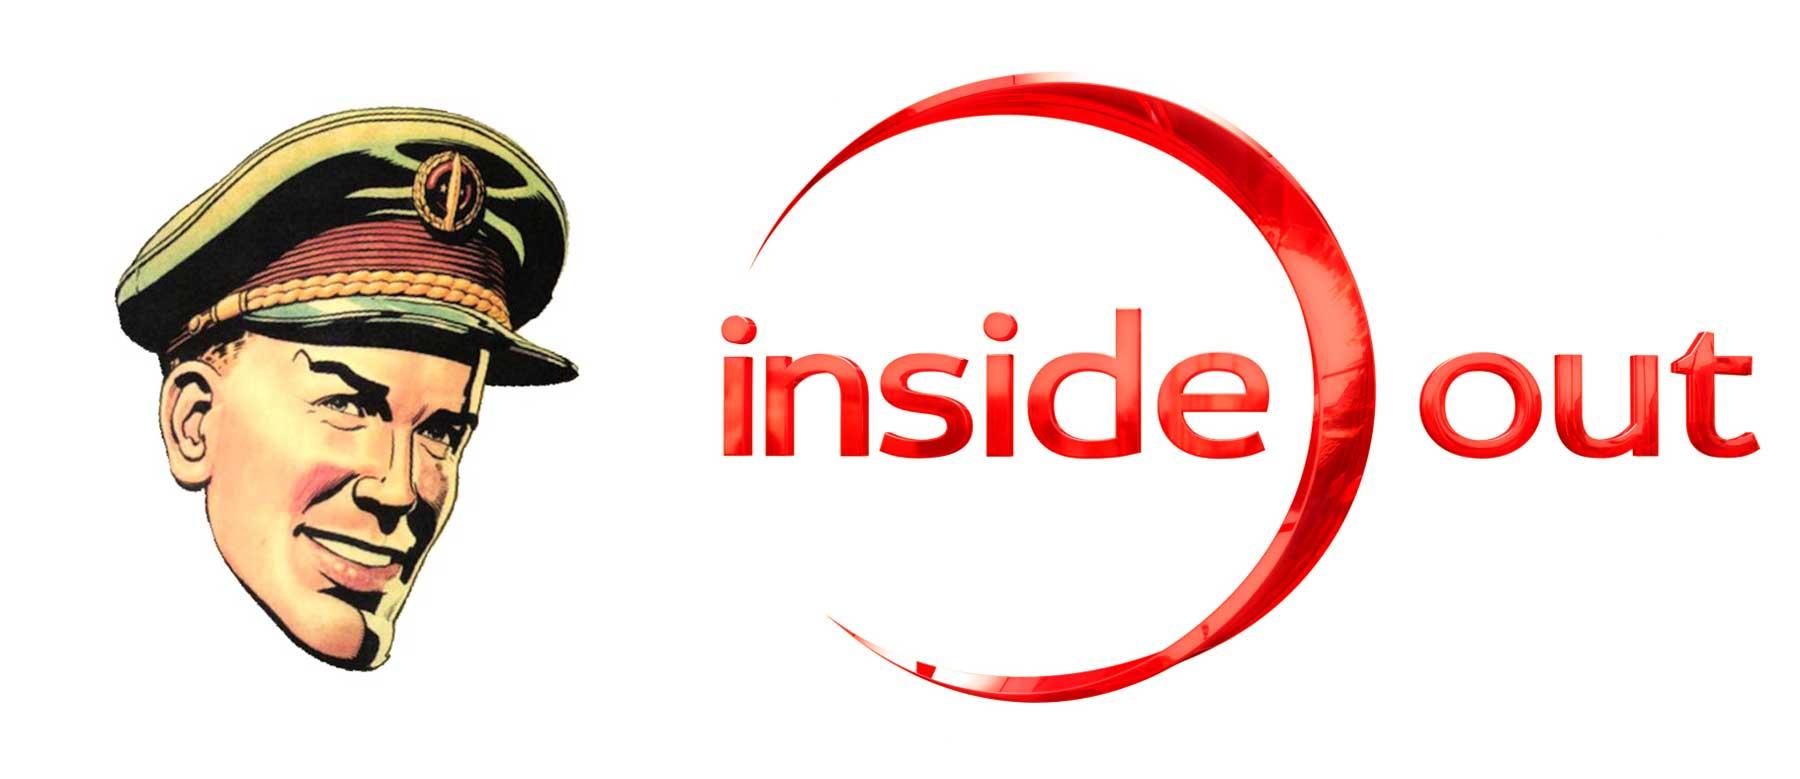 BBC Inside Out and Dan Dare